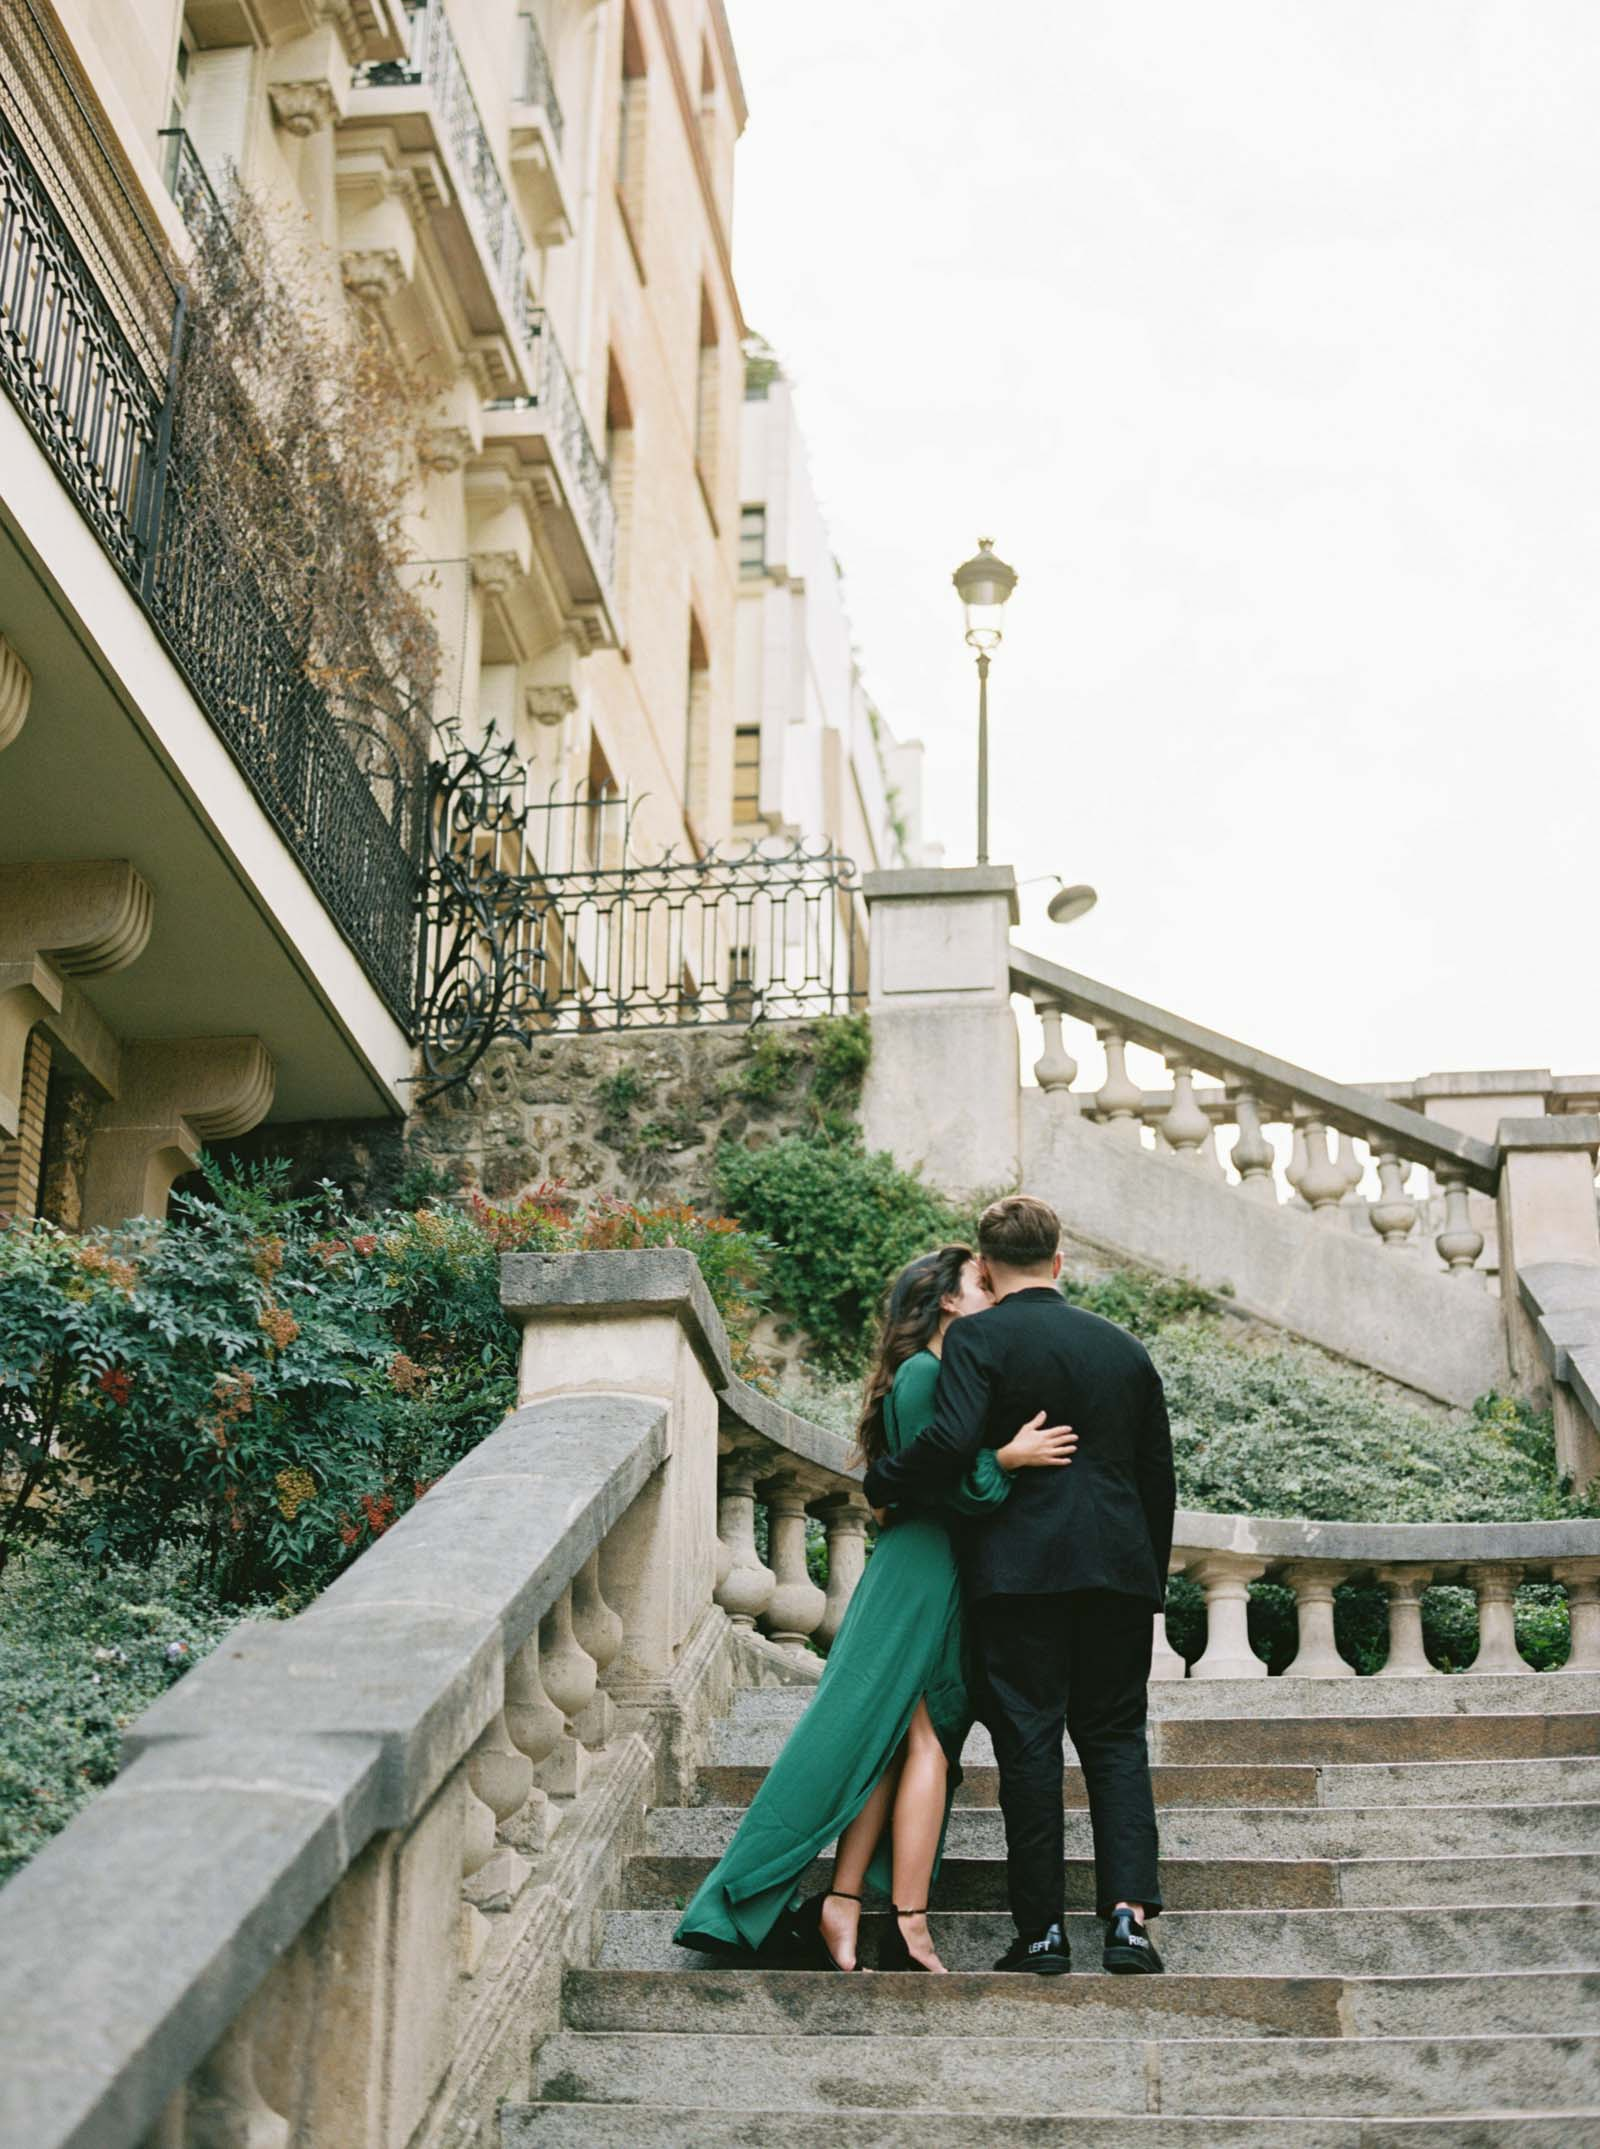 Emerald Green Dress - Engagement Photos - KR Moreno Photo